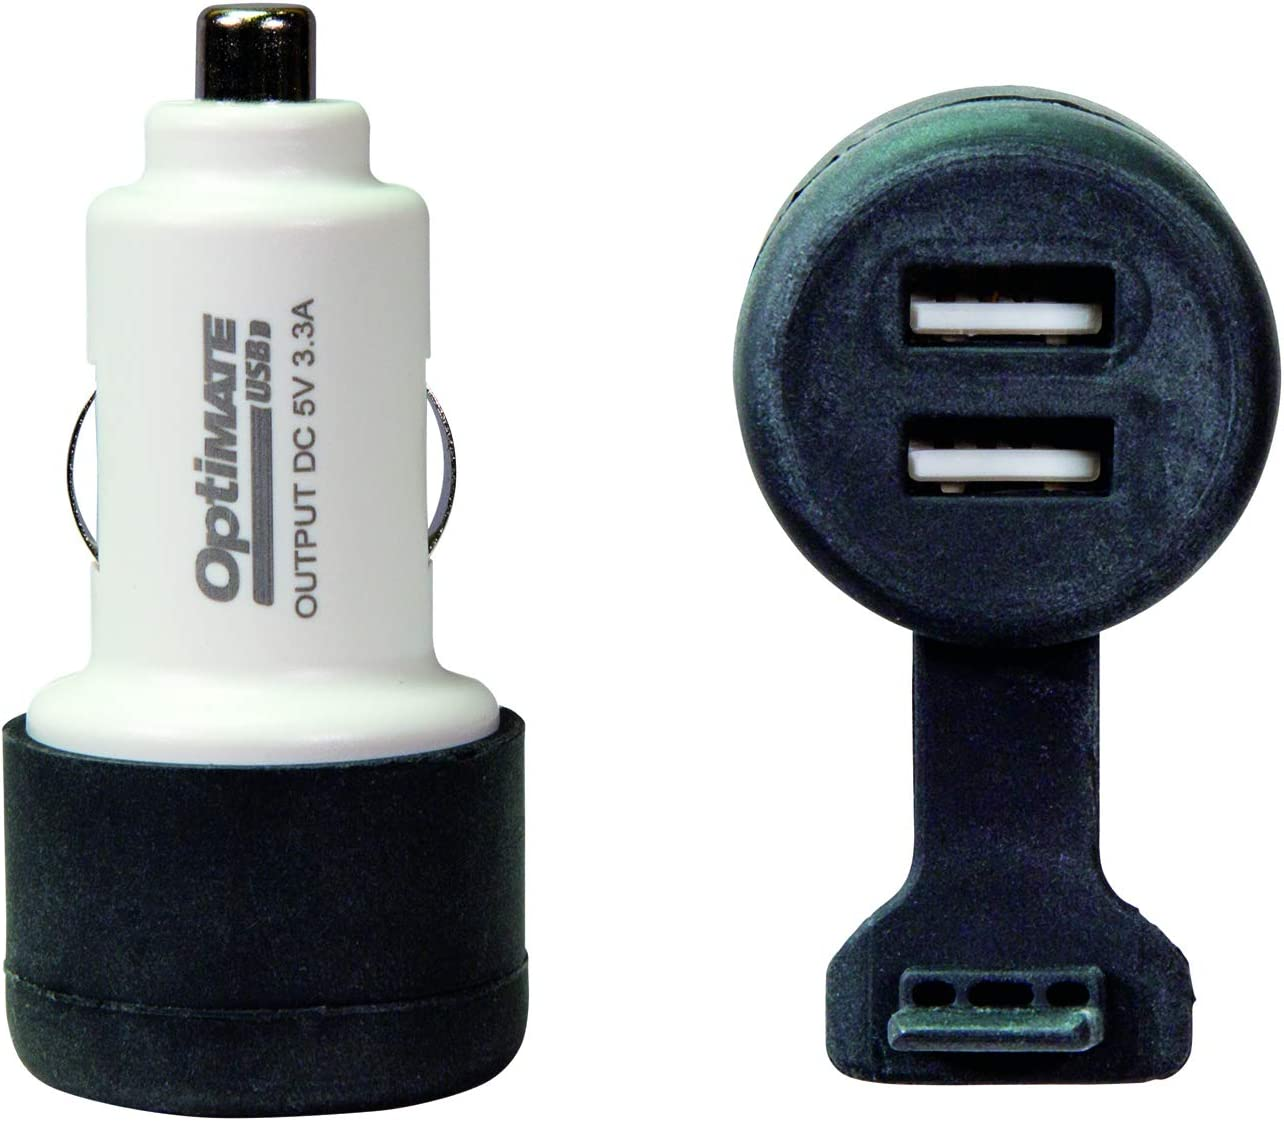 with AUTO plug. 3300mA dual output USB charger OptiMATE USB O-106